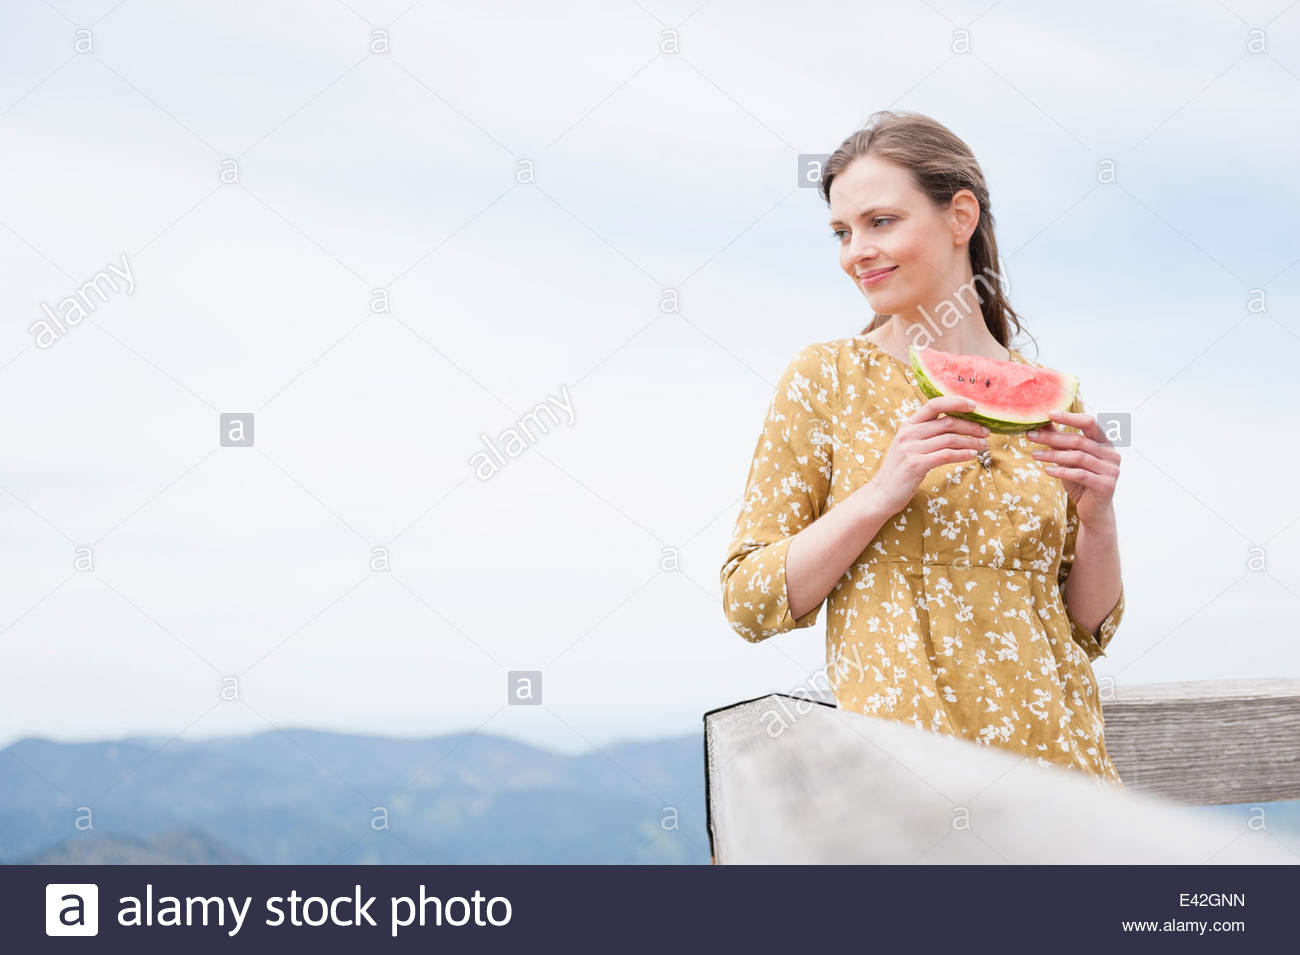 Metà donna adulta mangiando anguria, Wallberg, Tegernsee, Baviera, Germania Immagini Stock